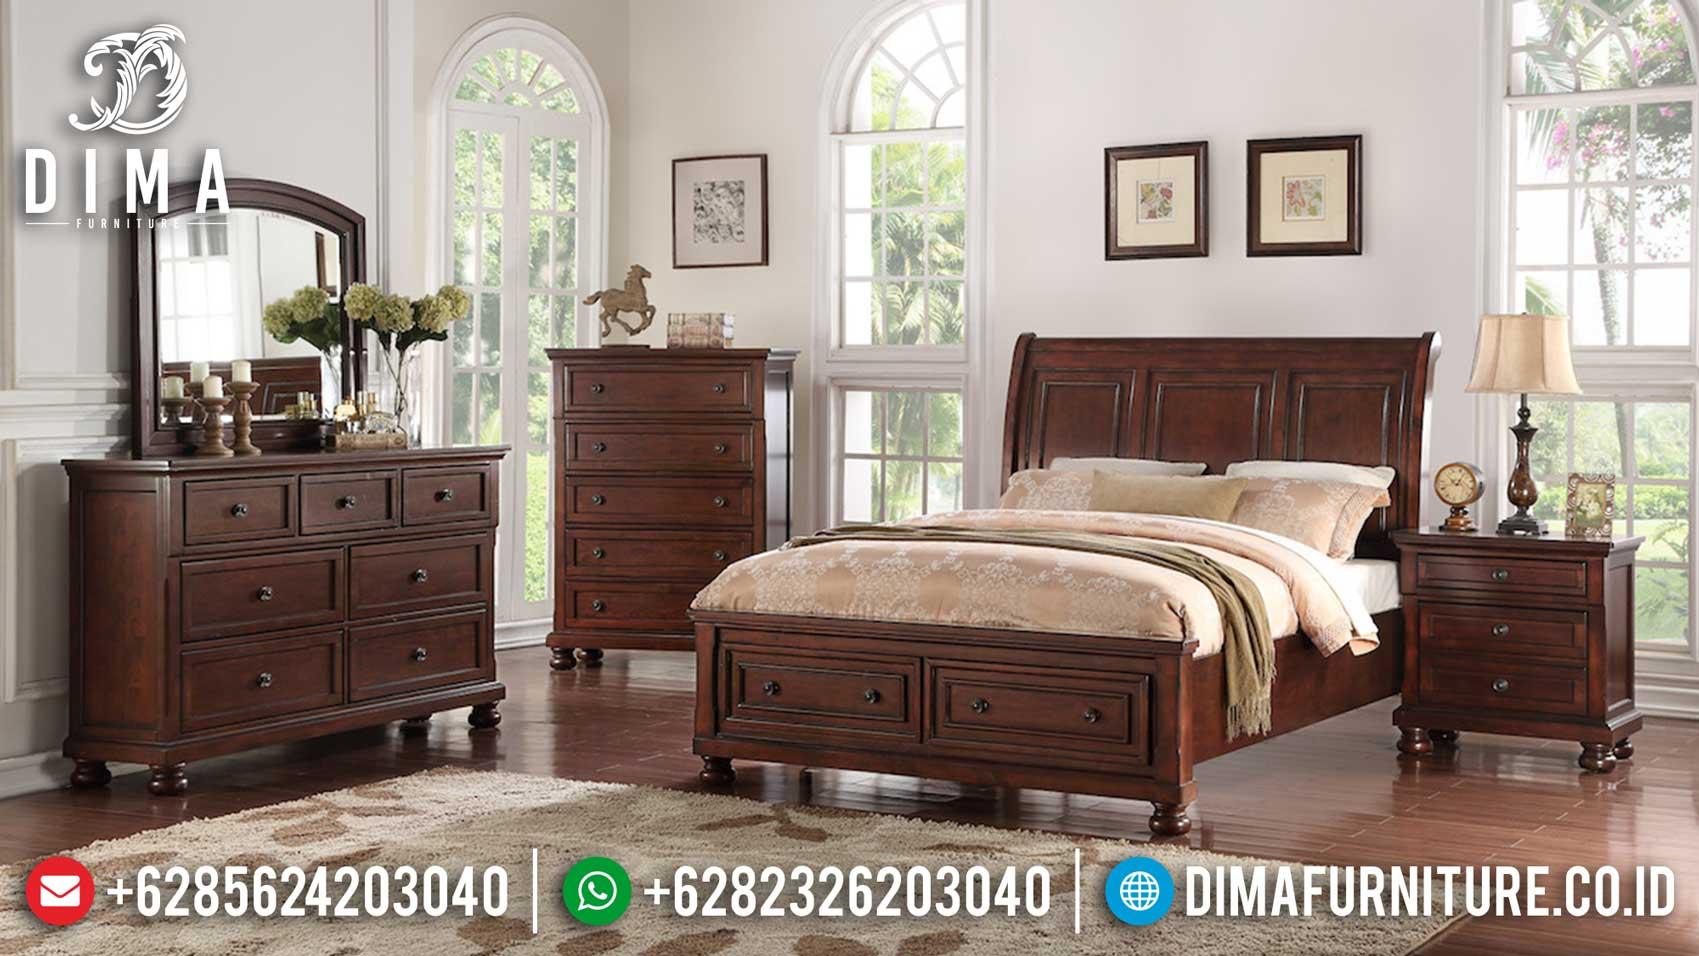 Harga Tempat Tidur Kayu Jati Perhutani Natural Great Solid Wood Class TTJ-1094